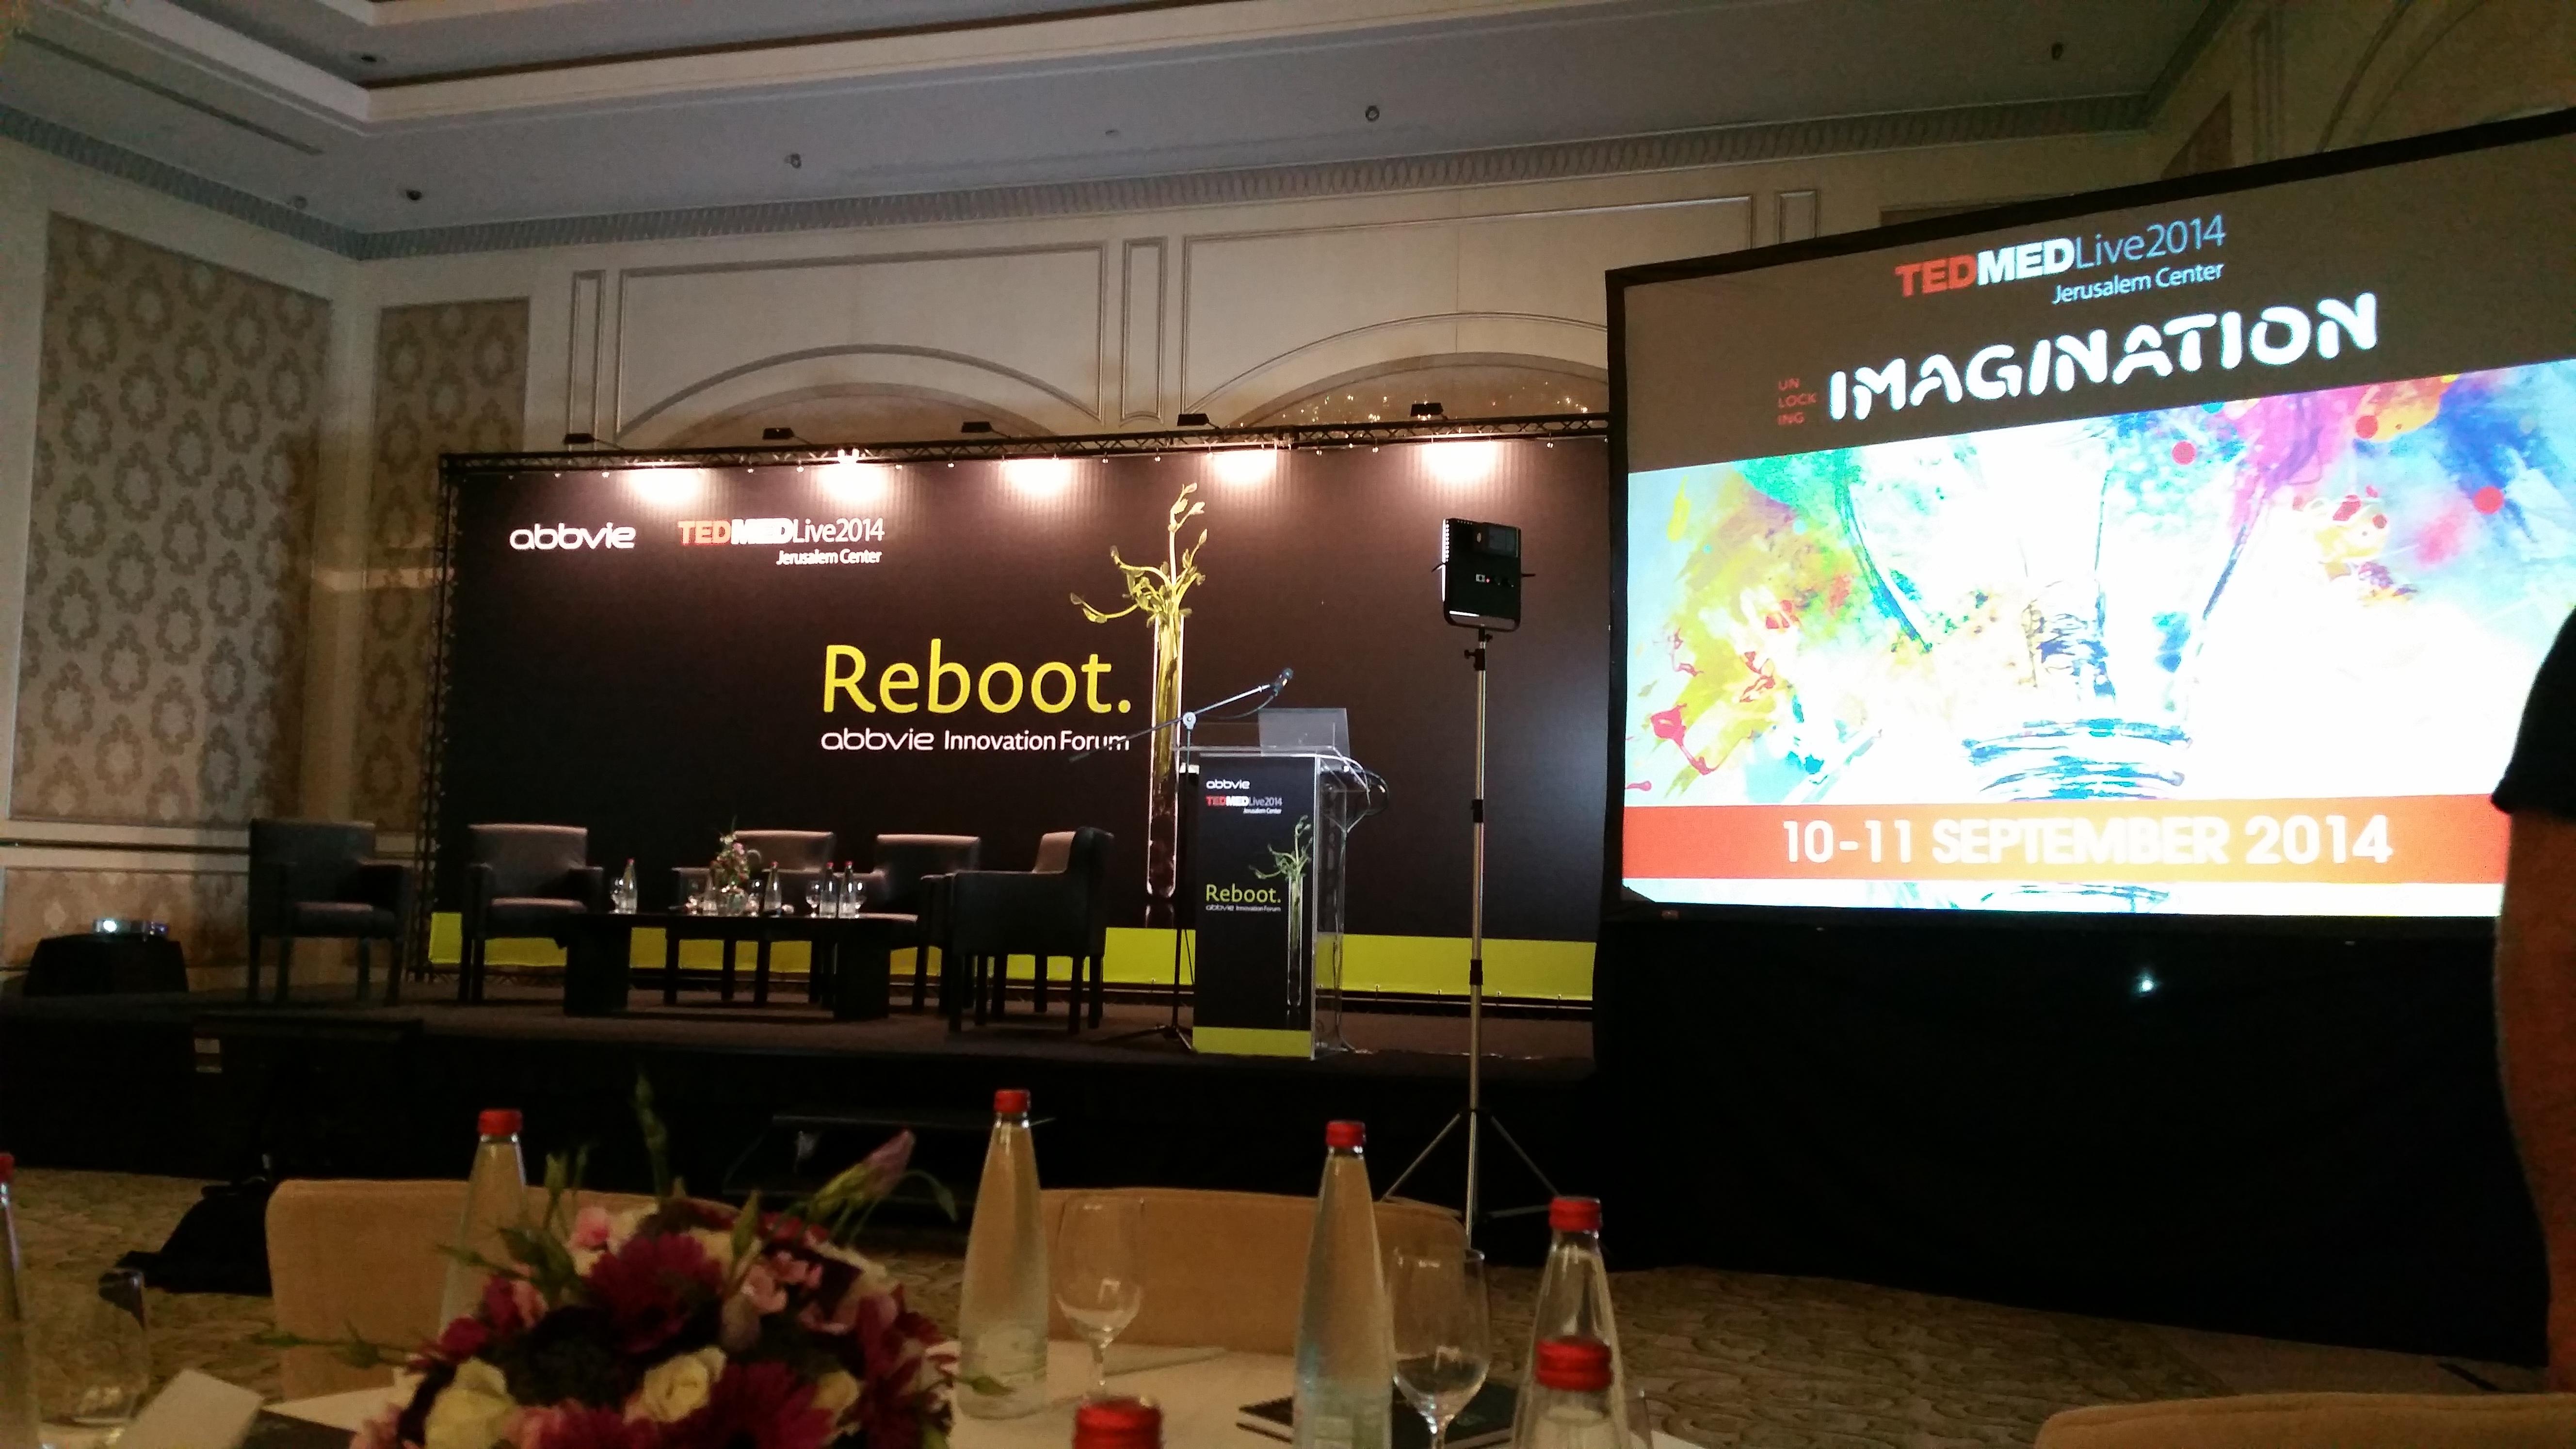 TedMed Israeli conference